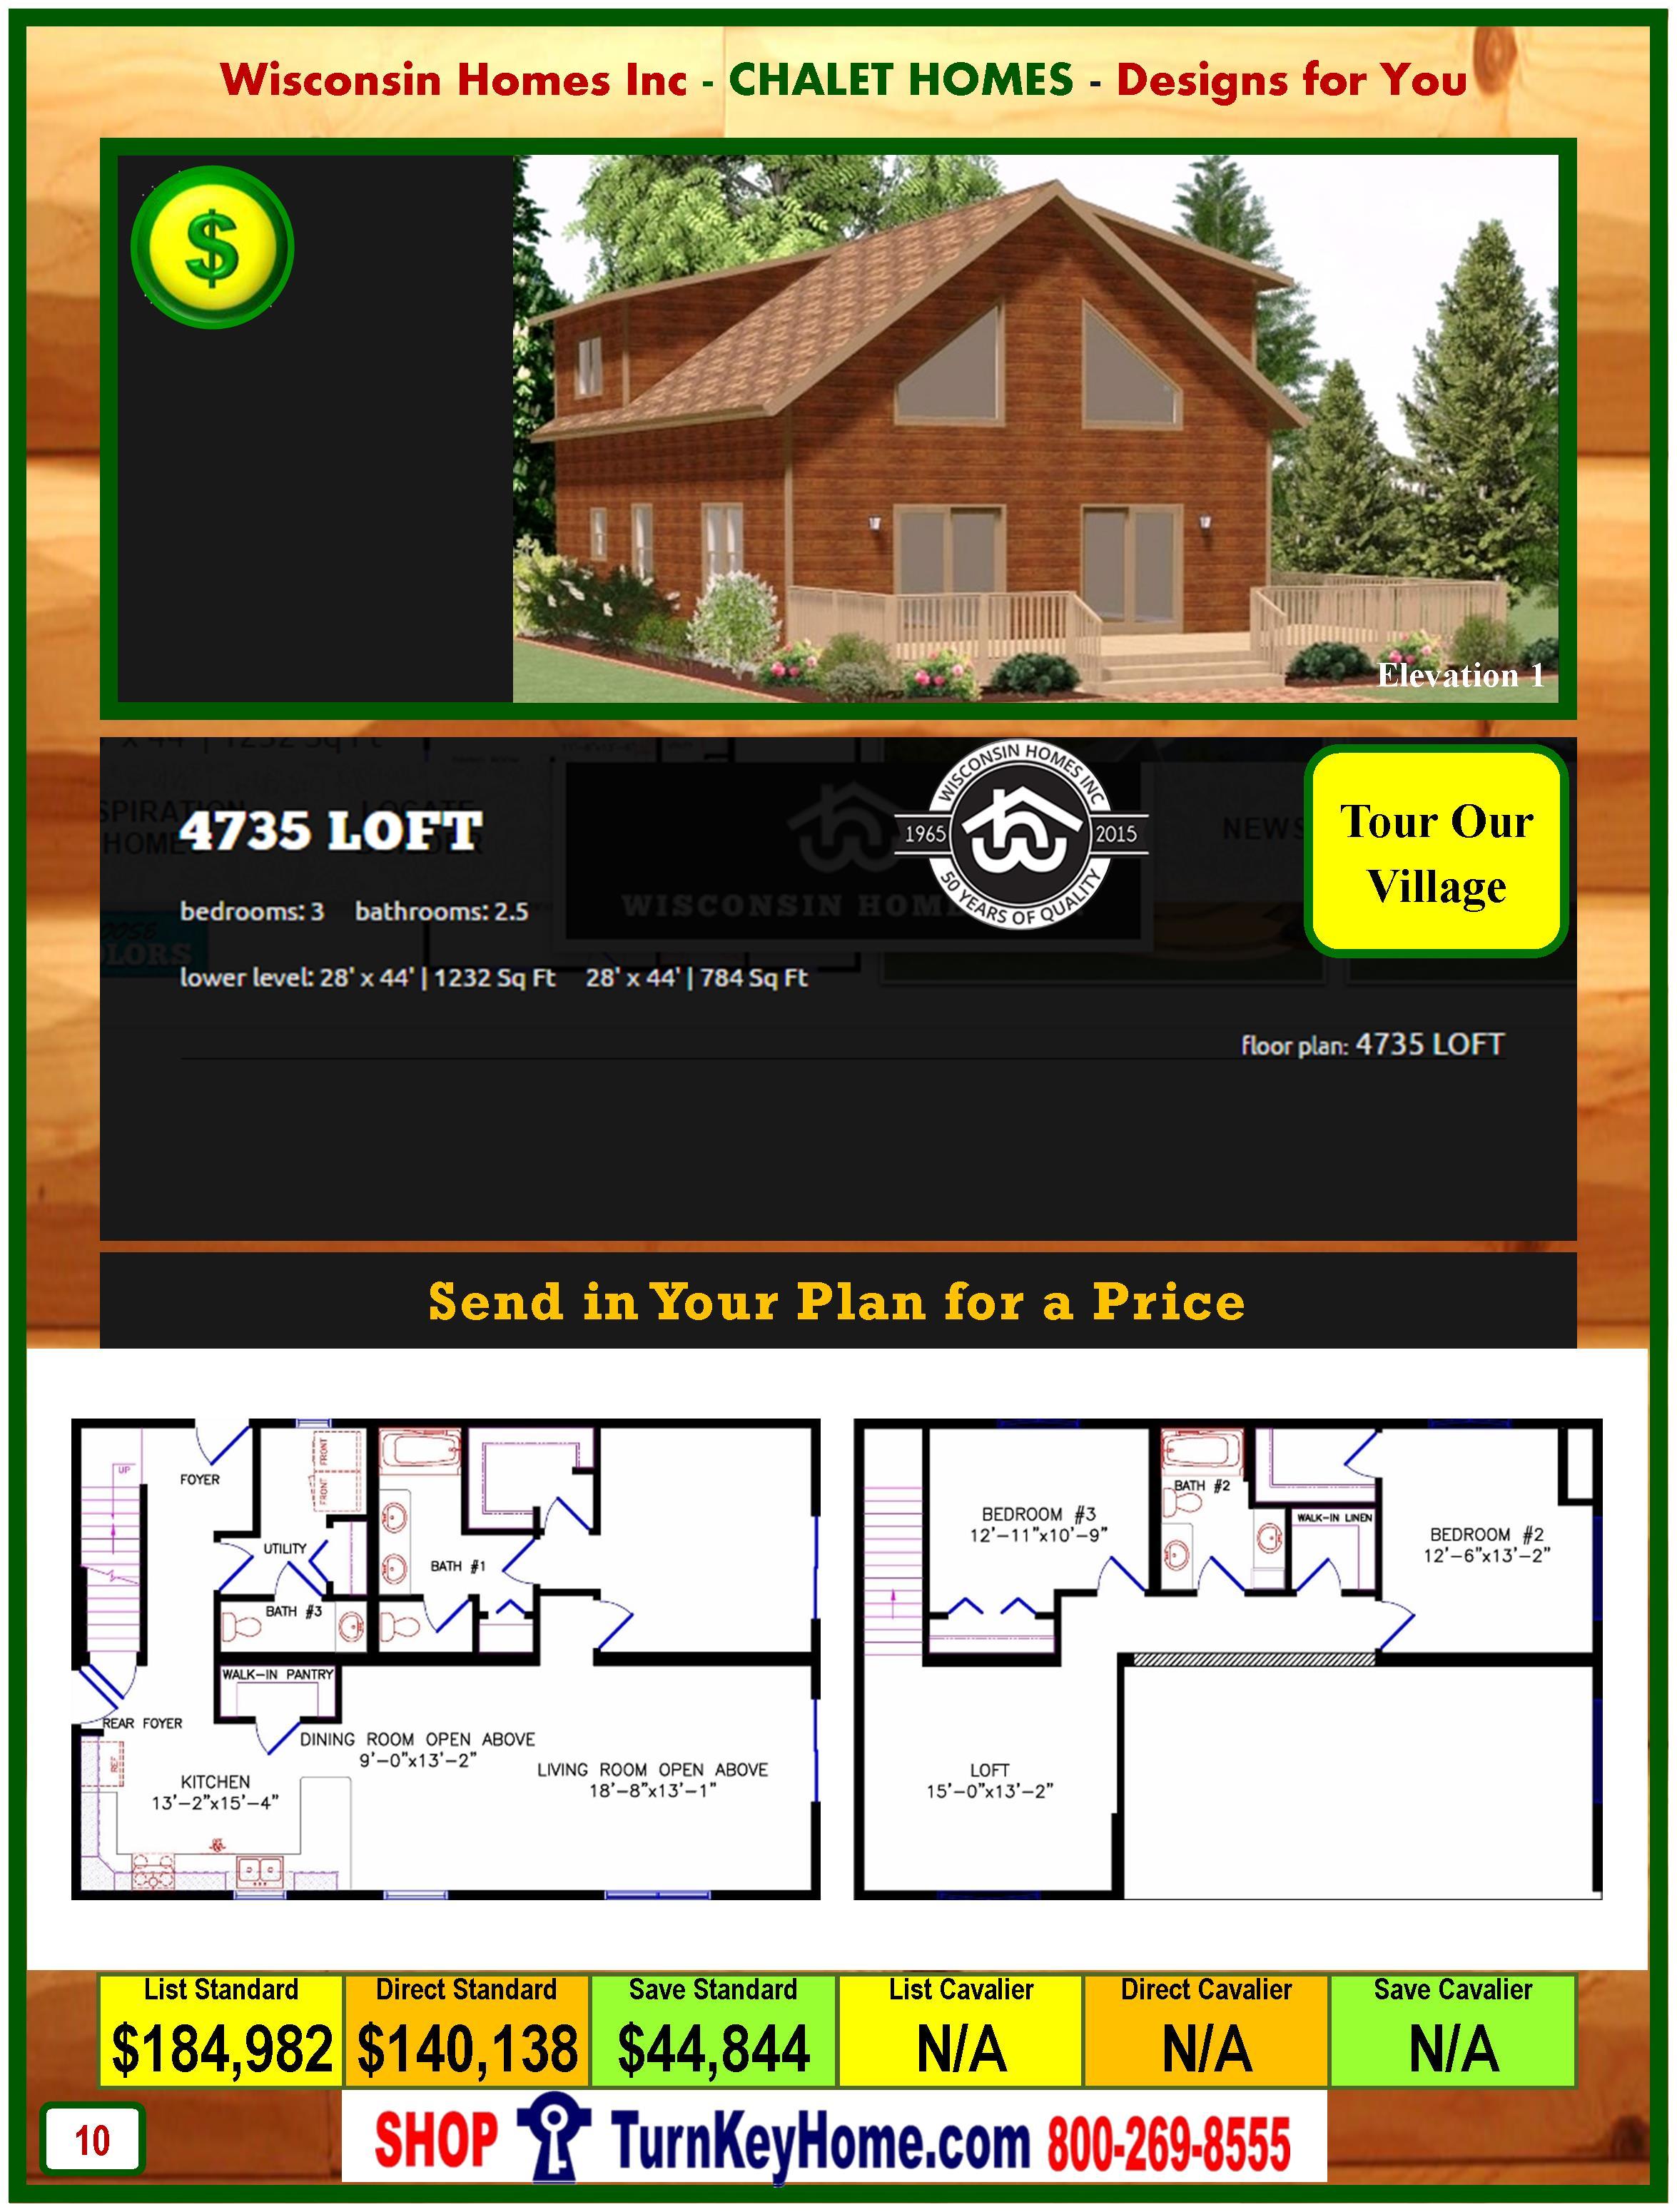 Modular.Home.Catalog.Wisconsin.Homes.Inc.Chalet.Loft.4735.P10.1.1215